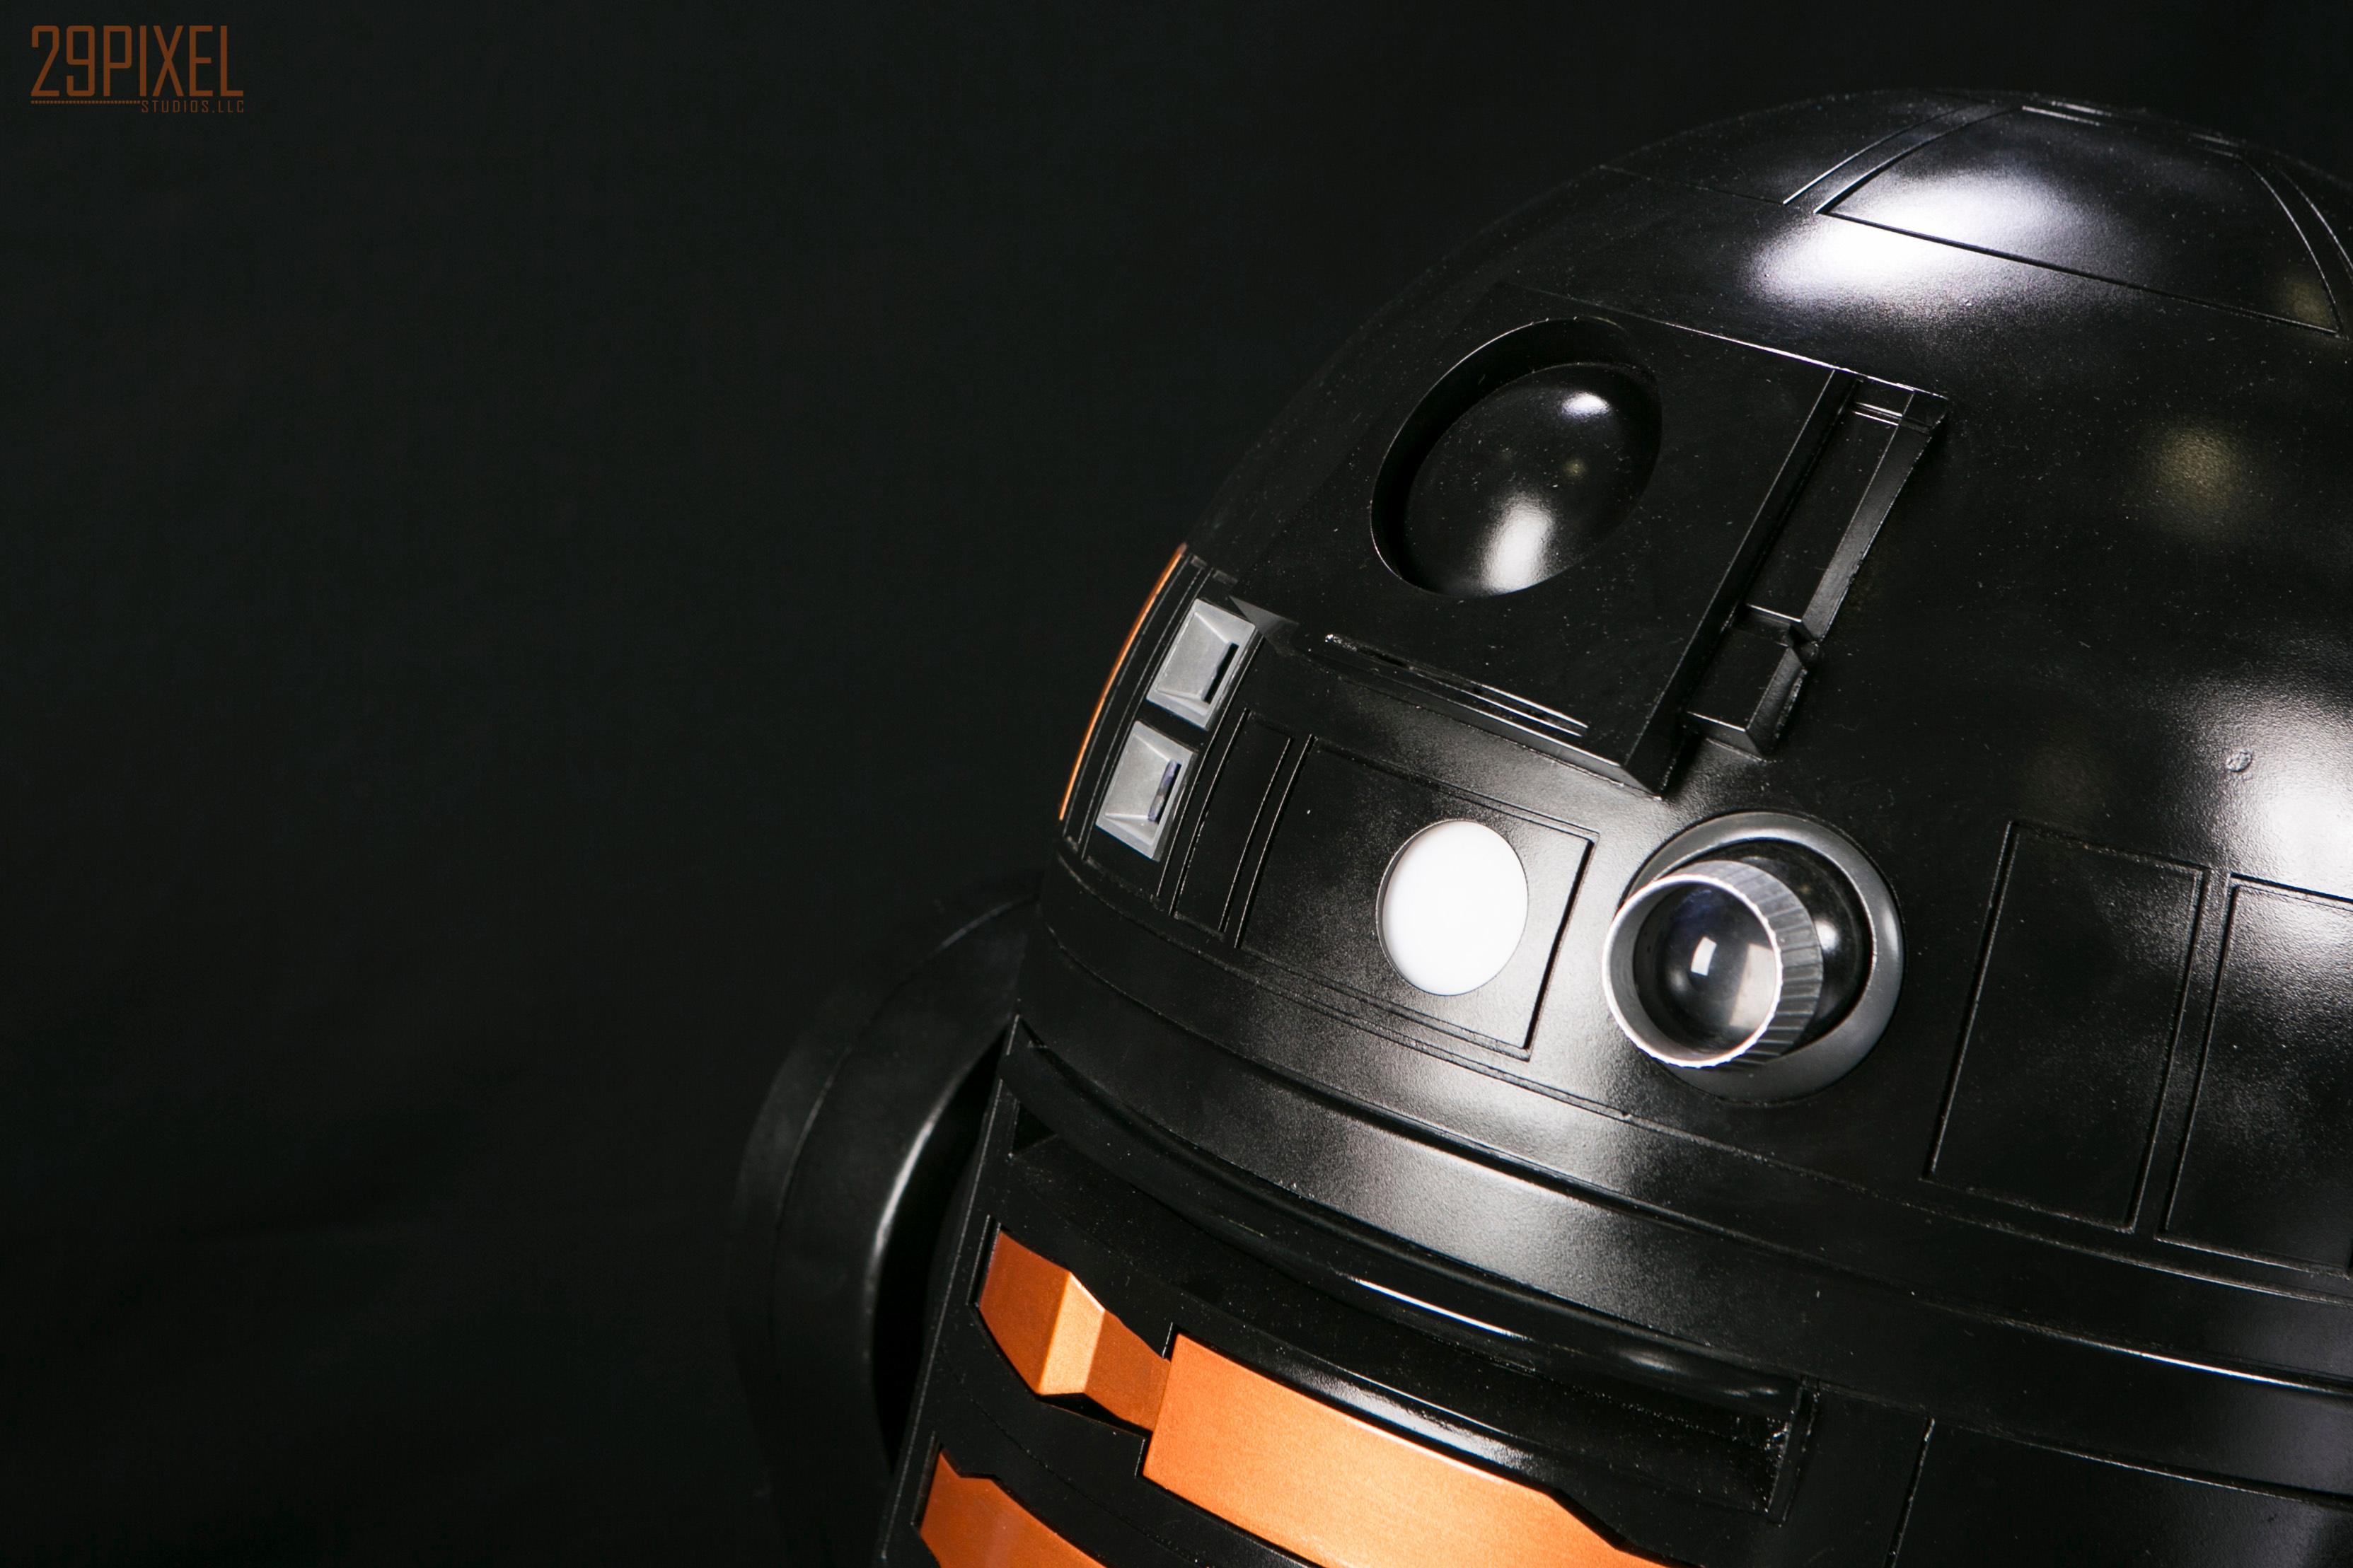 Joel's R2-Q5 Dome